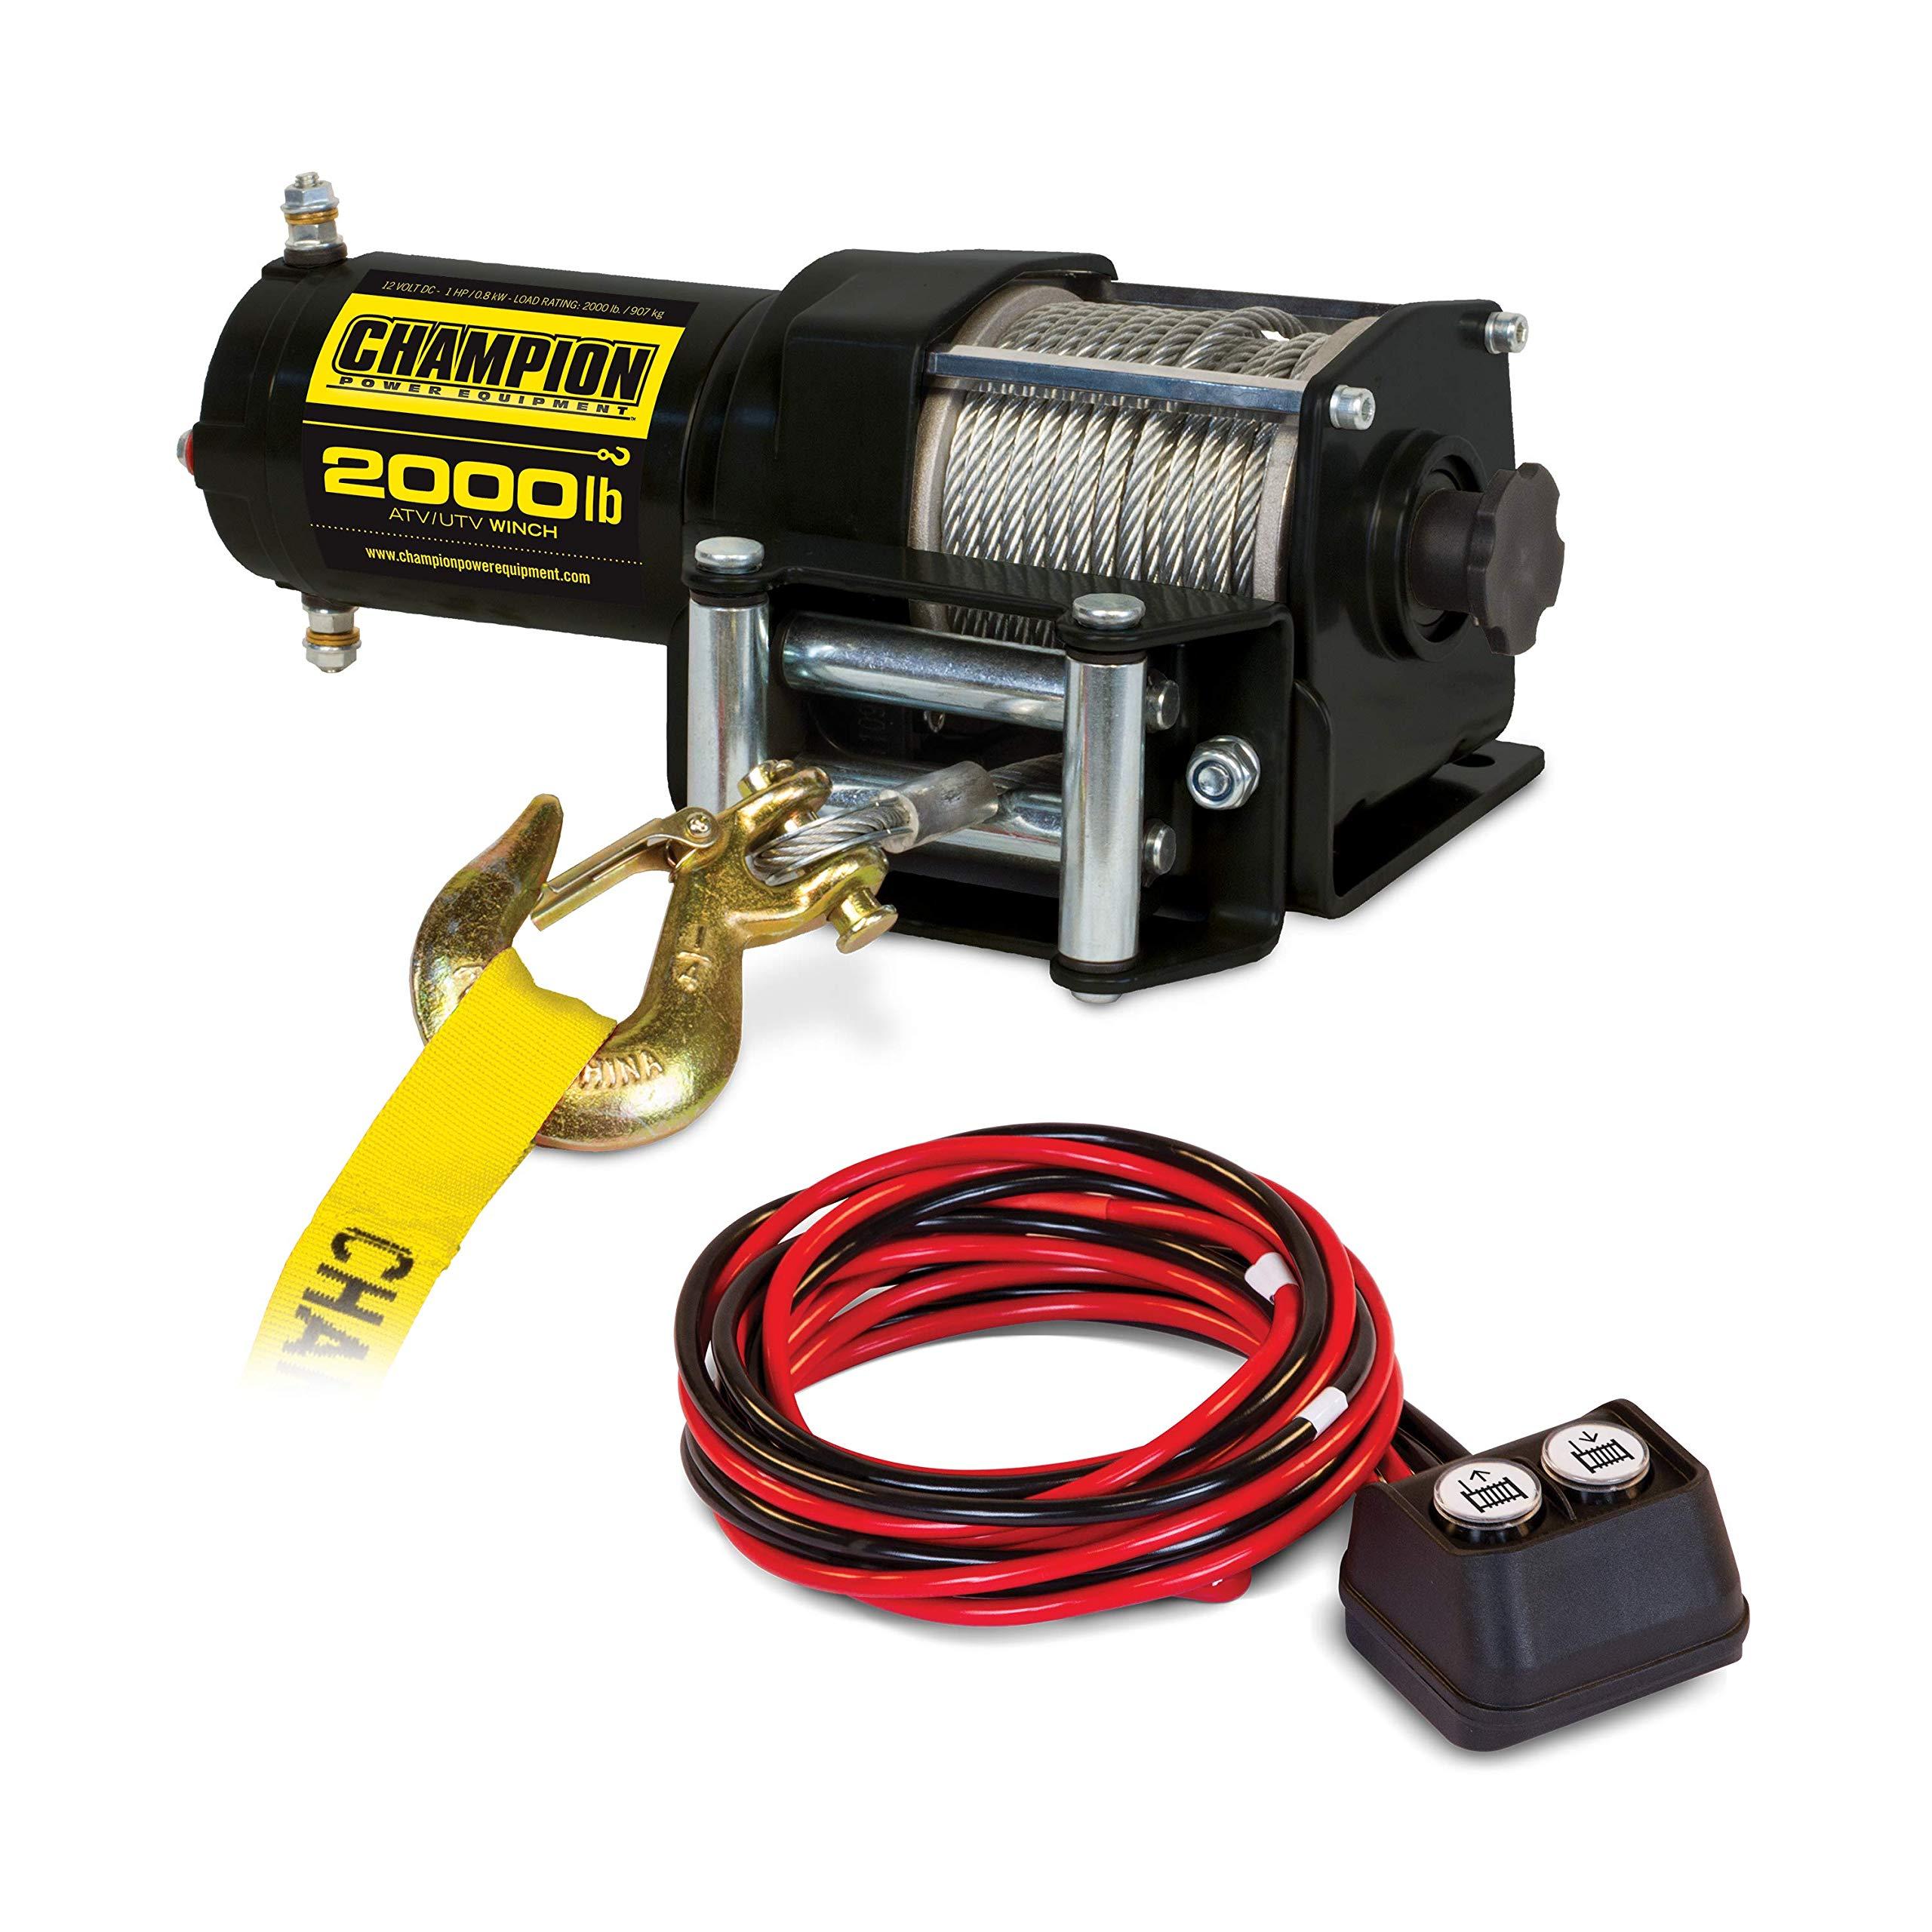 Champion 2000-lb. ATV/UTV Winch Kit by Champion Power Equipment